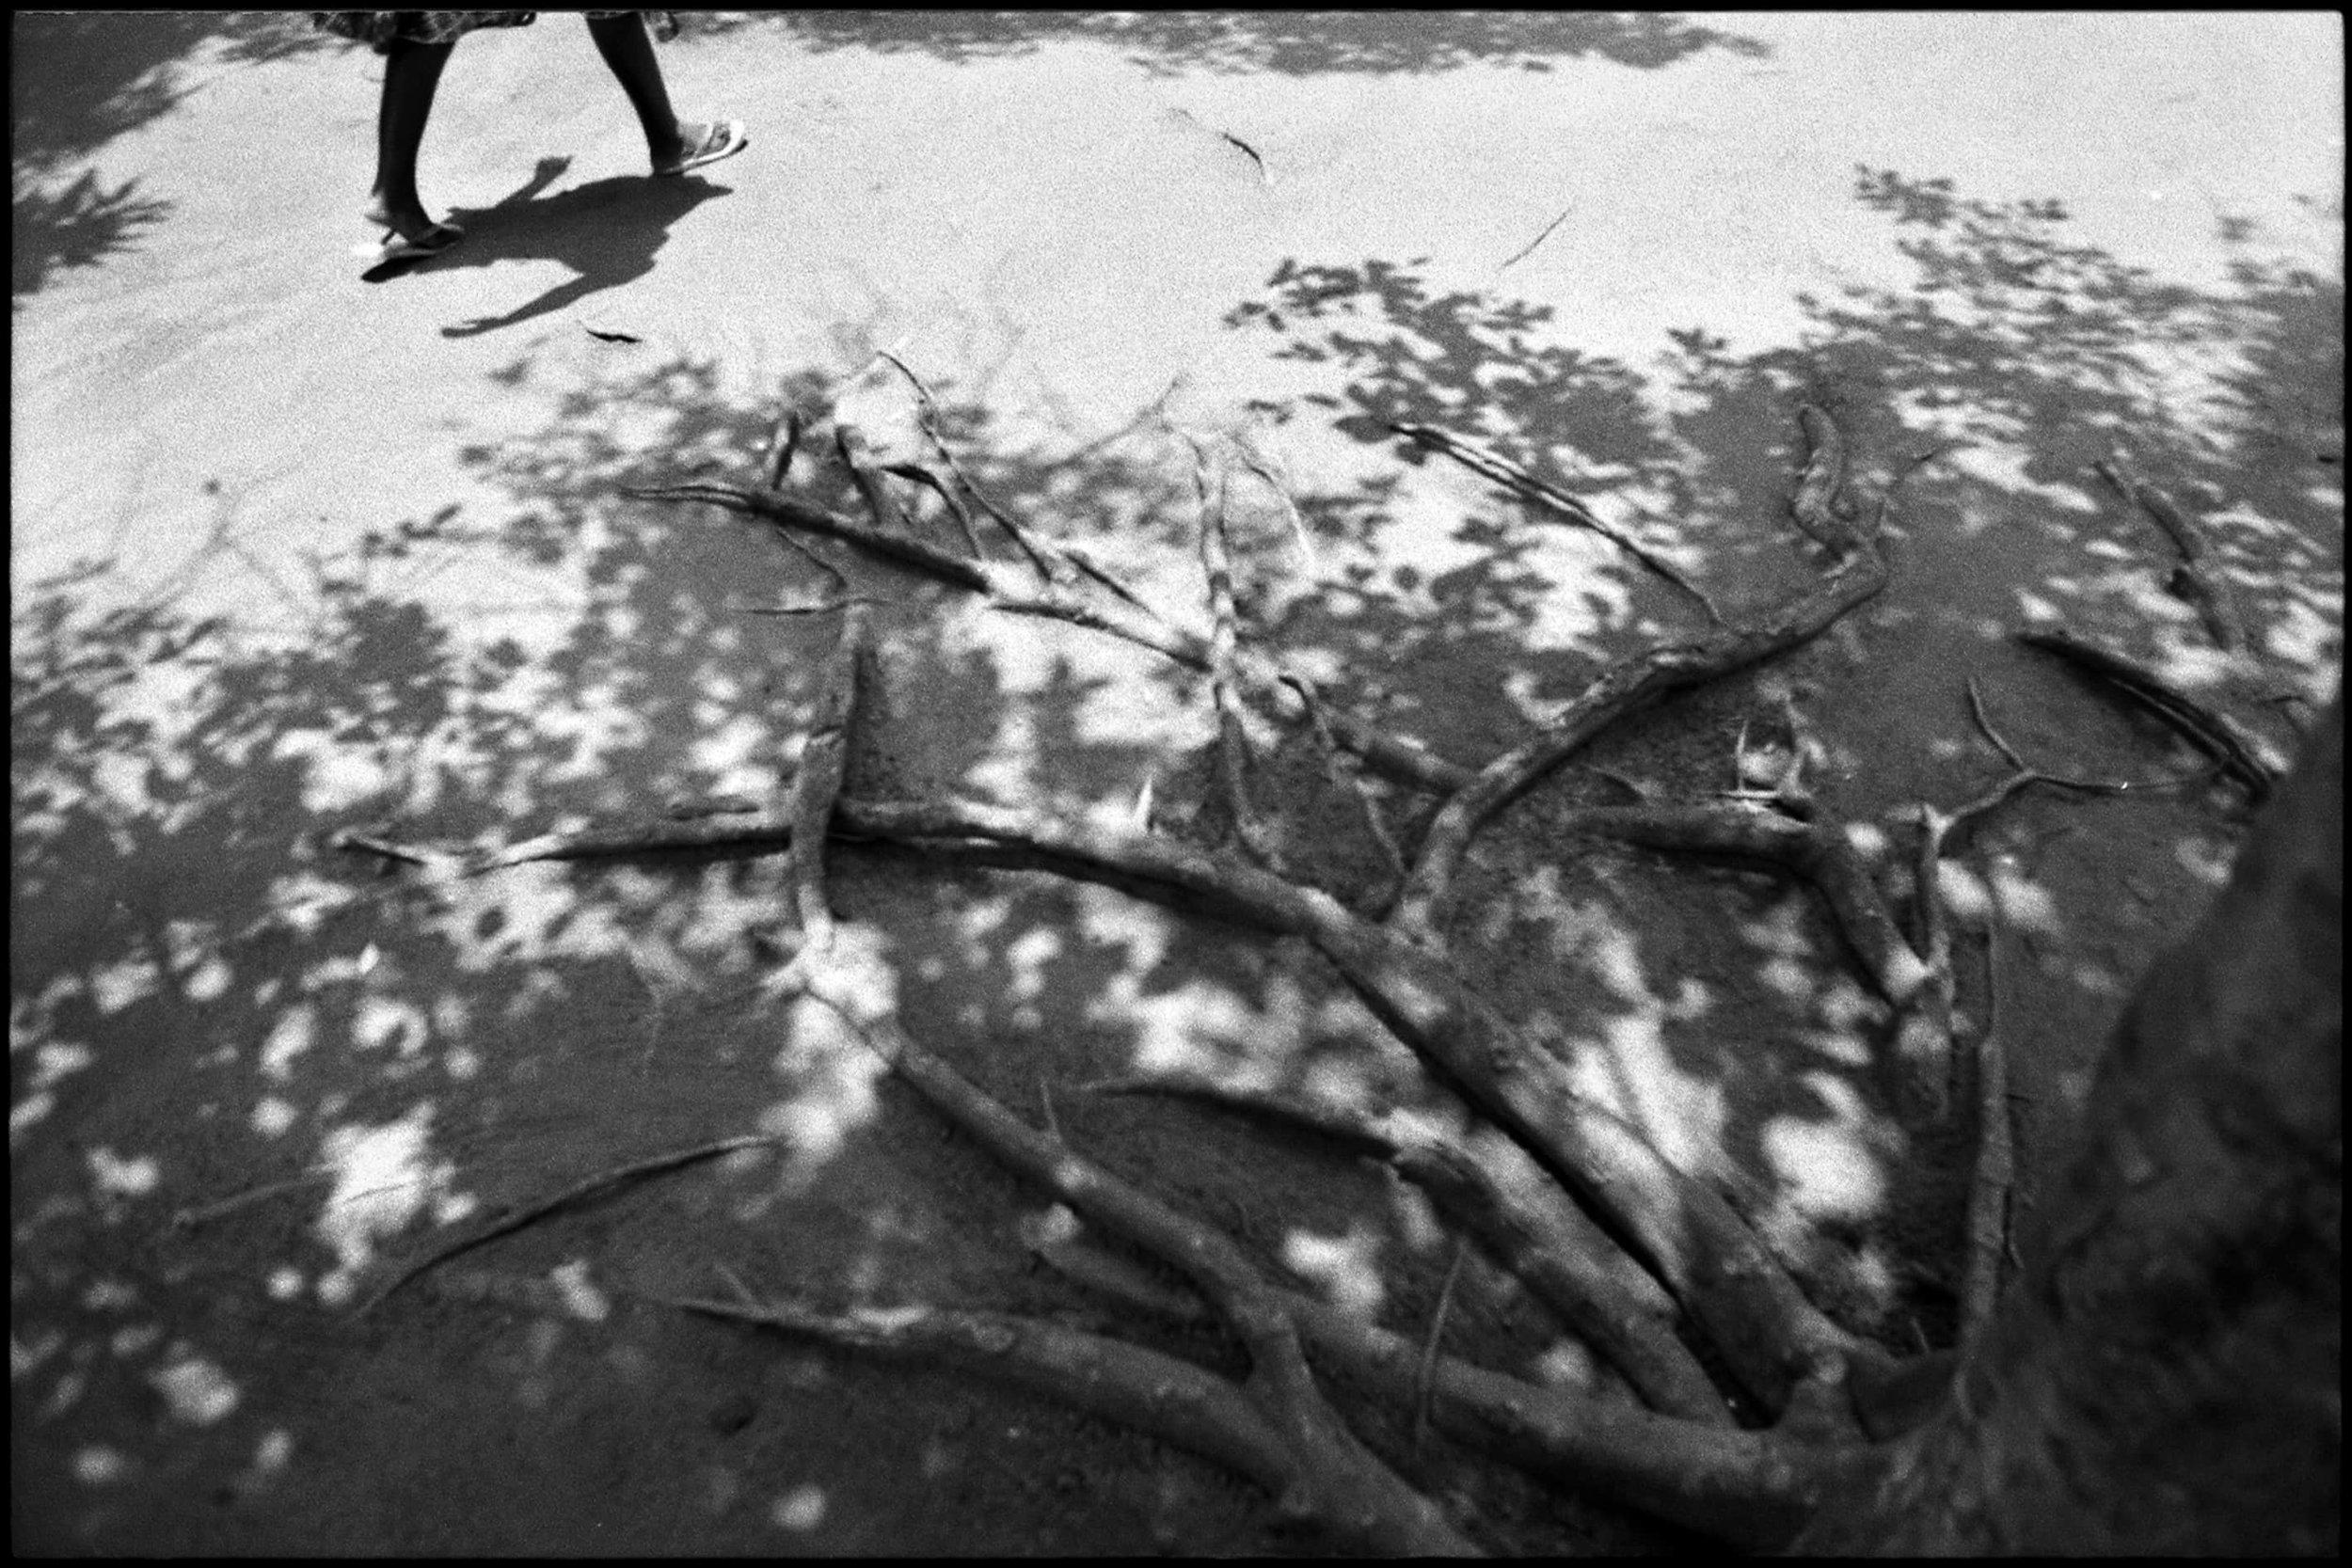 documentary-reportage-centre-les-archanges-fabio-burrelli-18.jpg